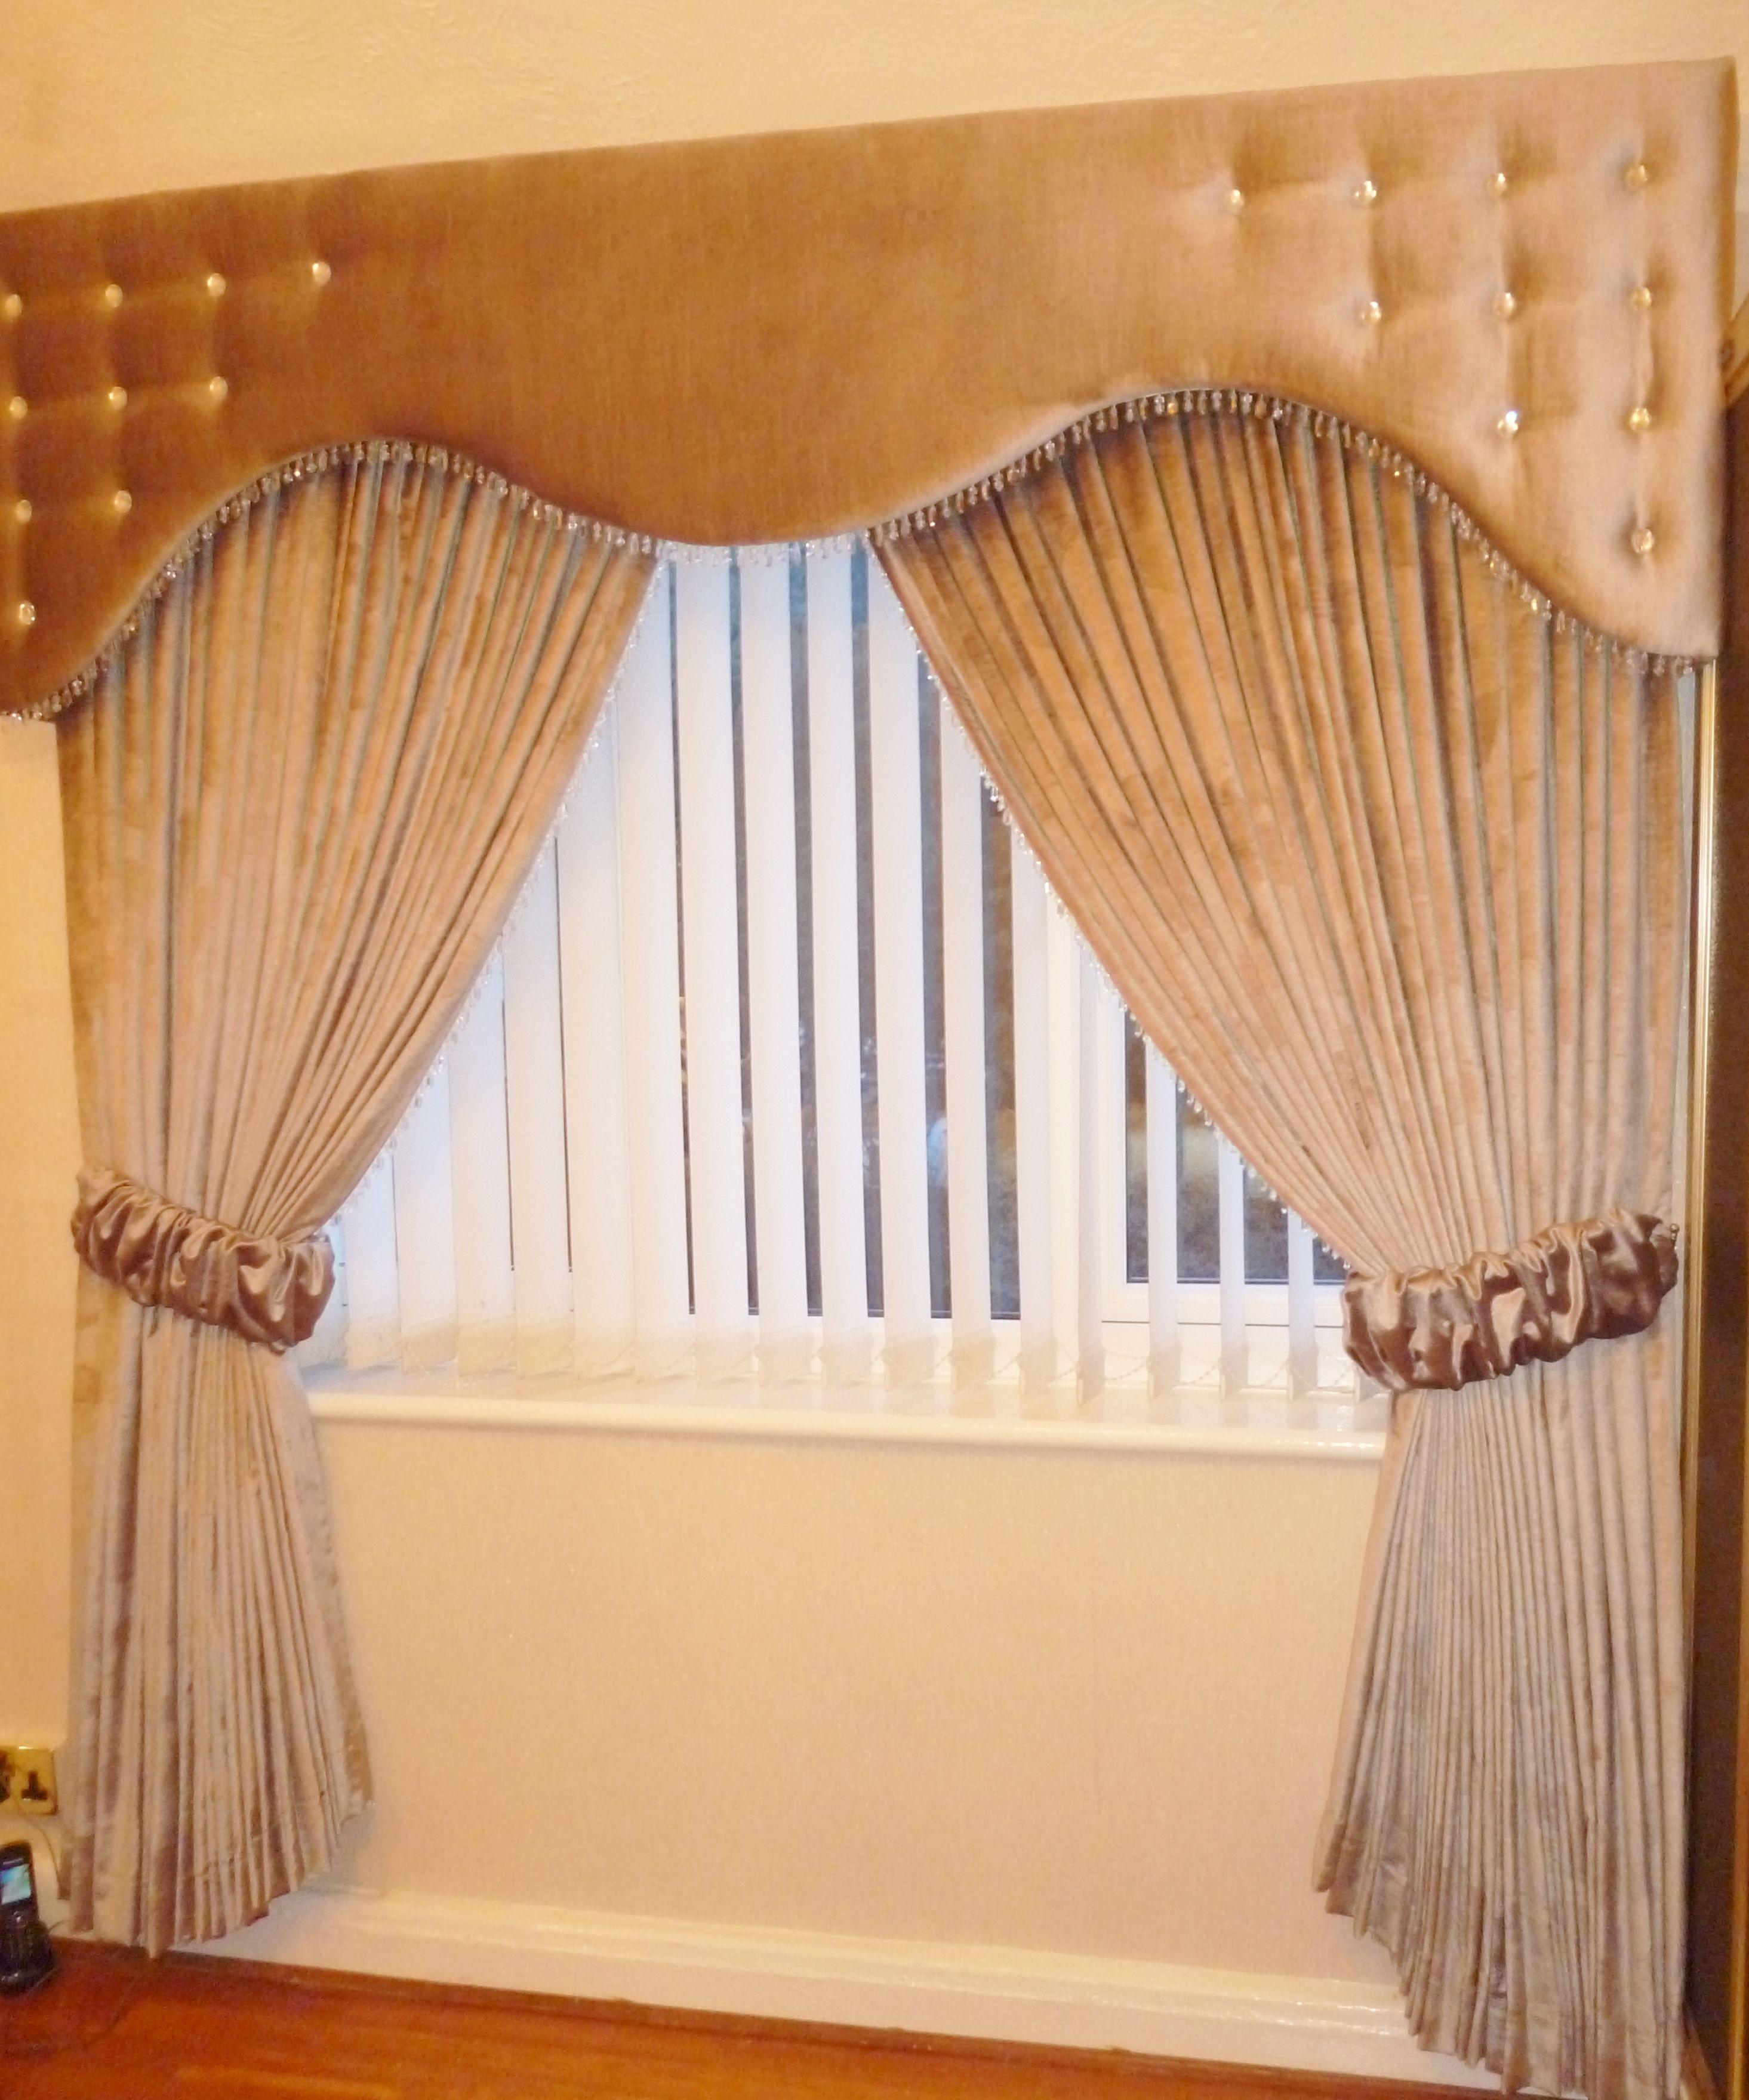 ruffle bow pelmet and curtain range гламур pinterest ranges